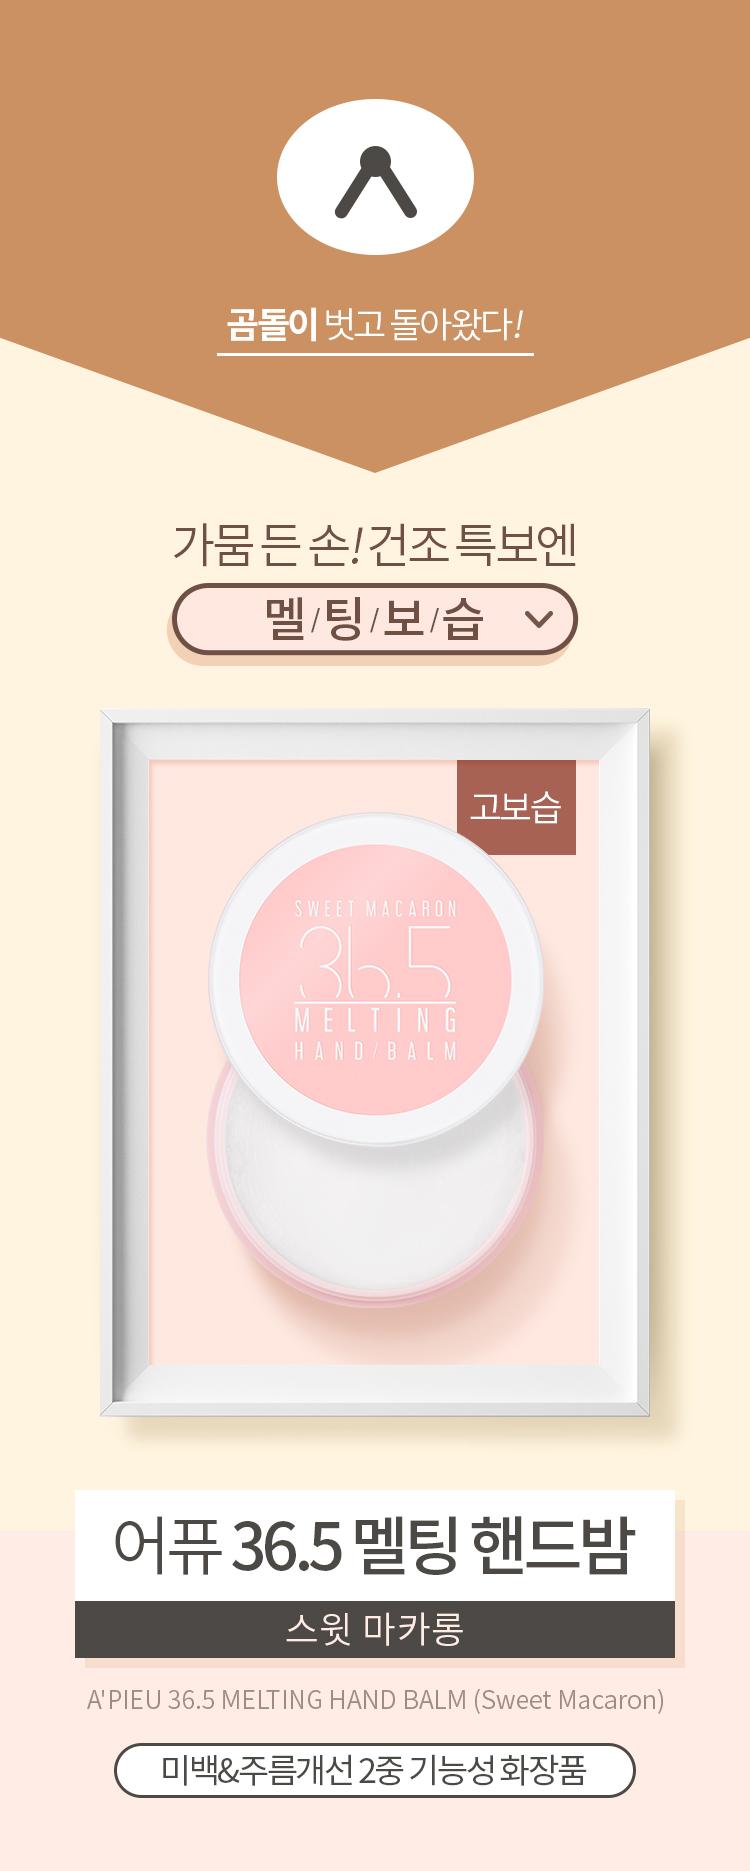 APIEU-365-MELTING-HAND-BALM-(Sweet-Macaron)_01.jpg